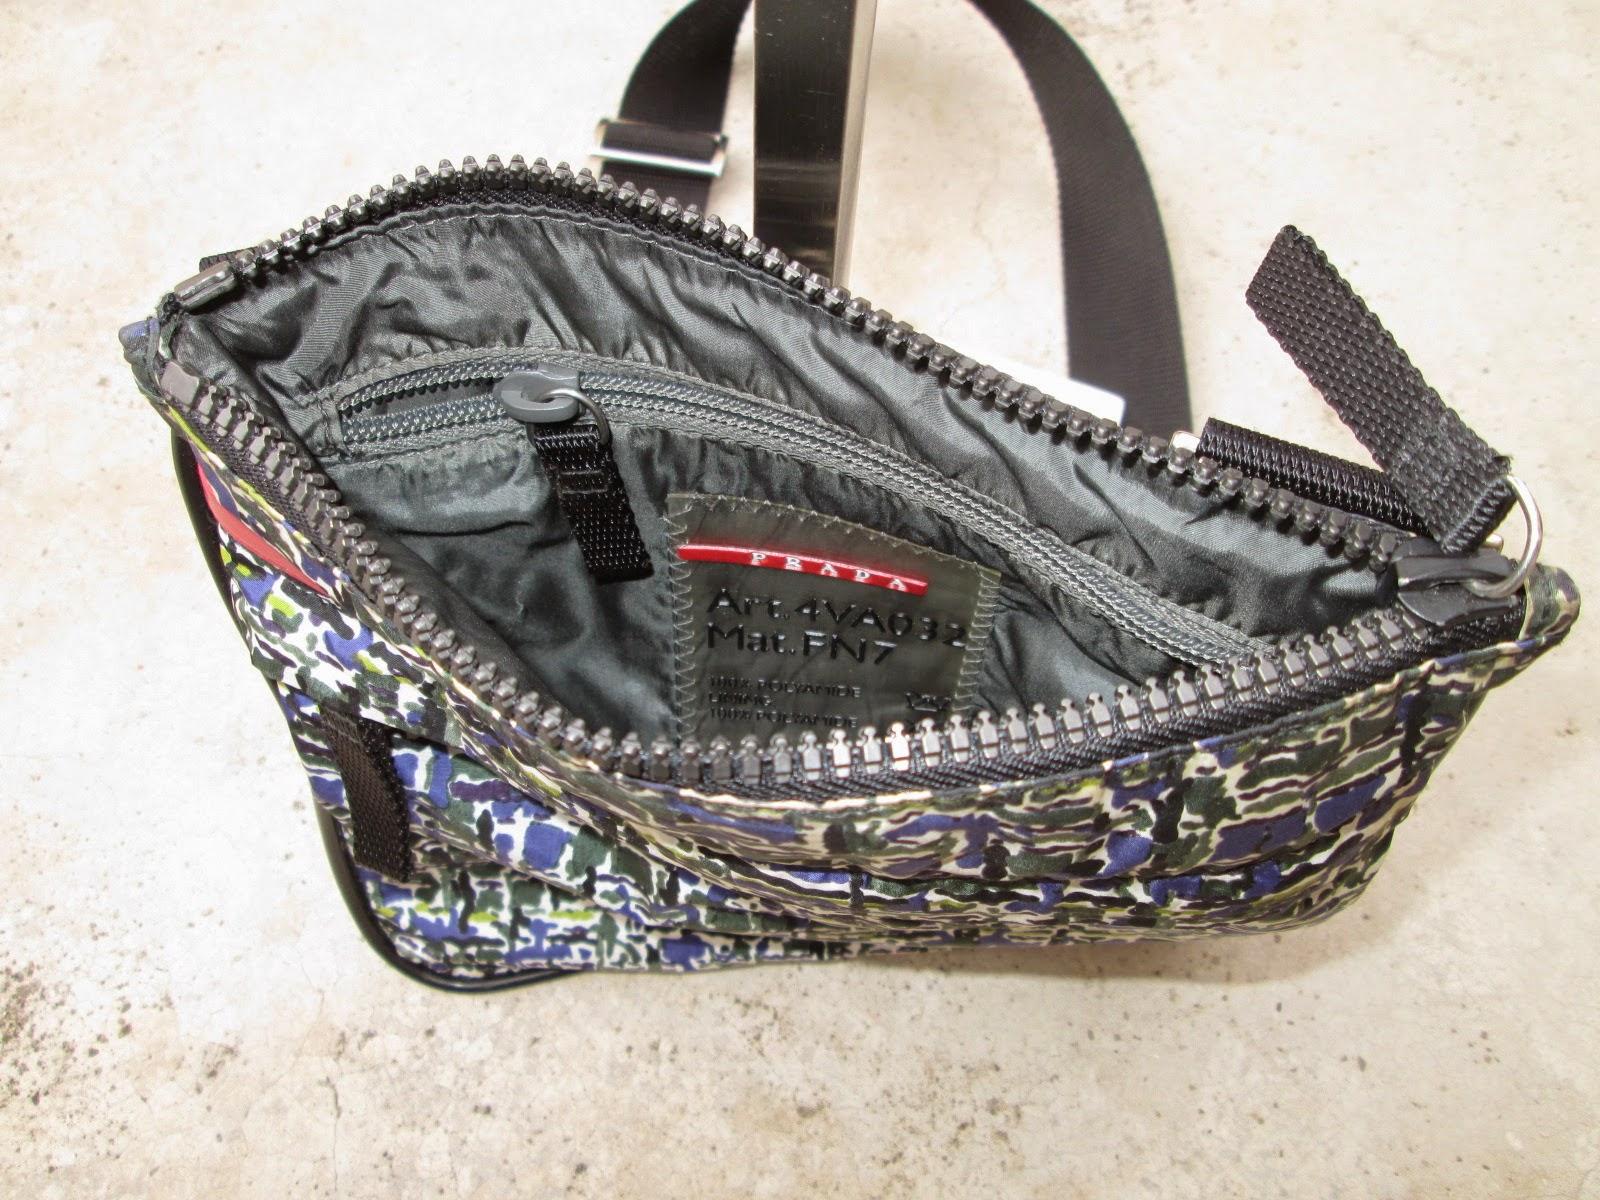 c66f6bcb5ba5 Authentic Prada Sling Bag Price | Stanford Center for Opportunity ...